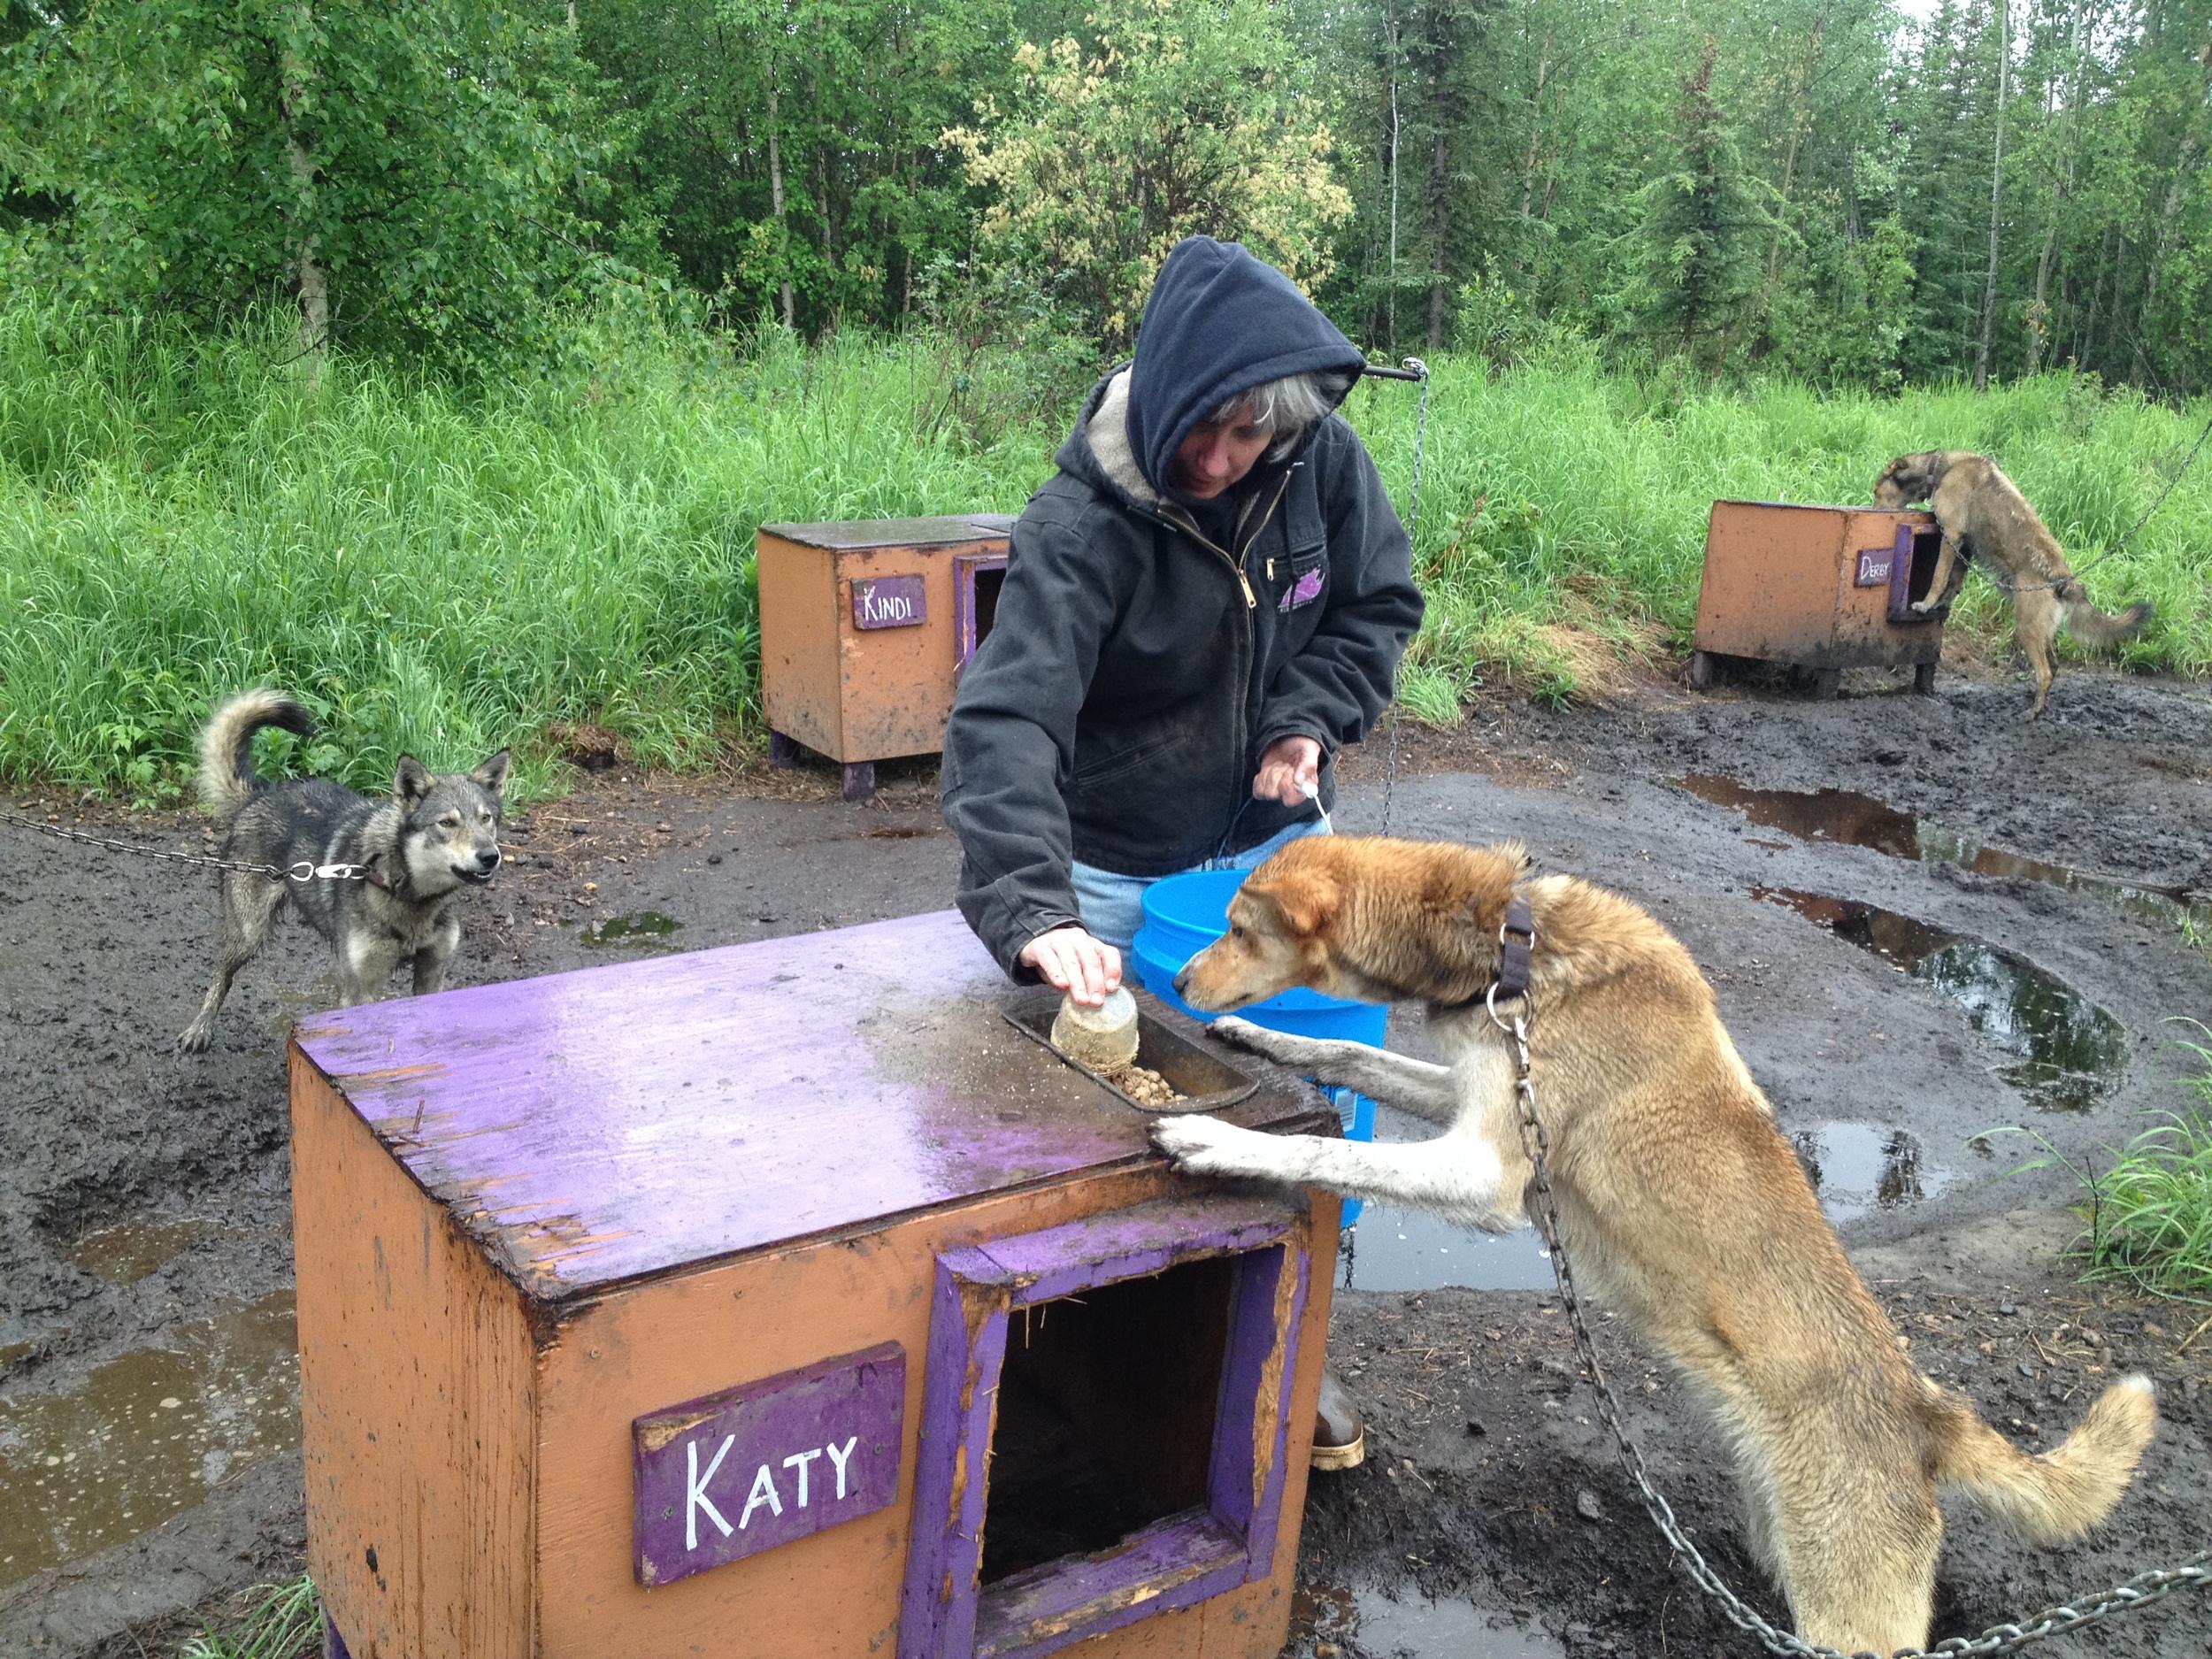 Katy Human feeding Katy Canine